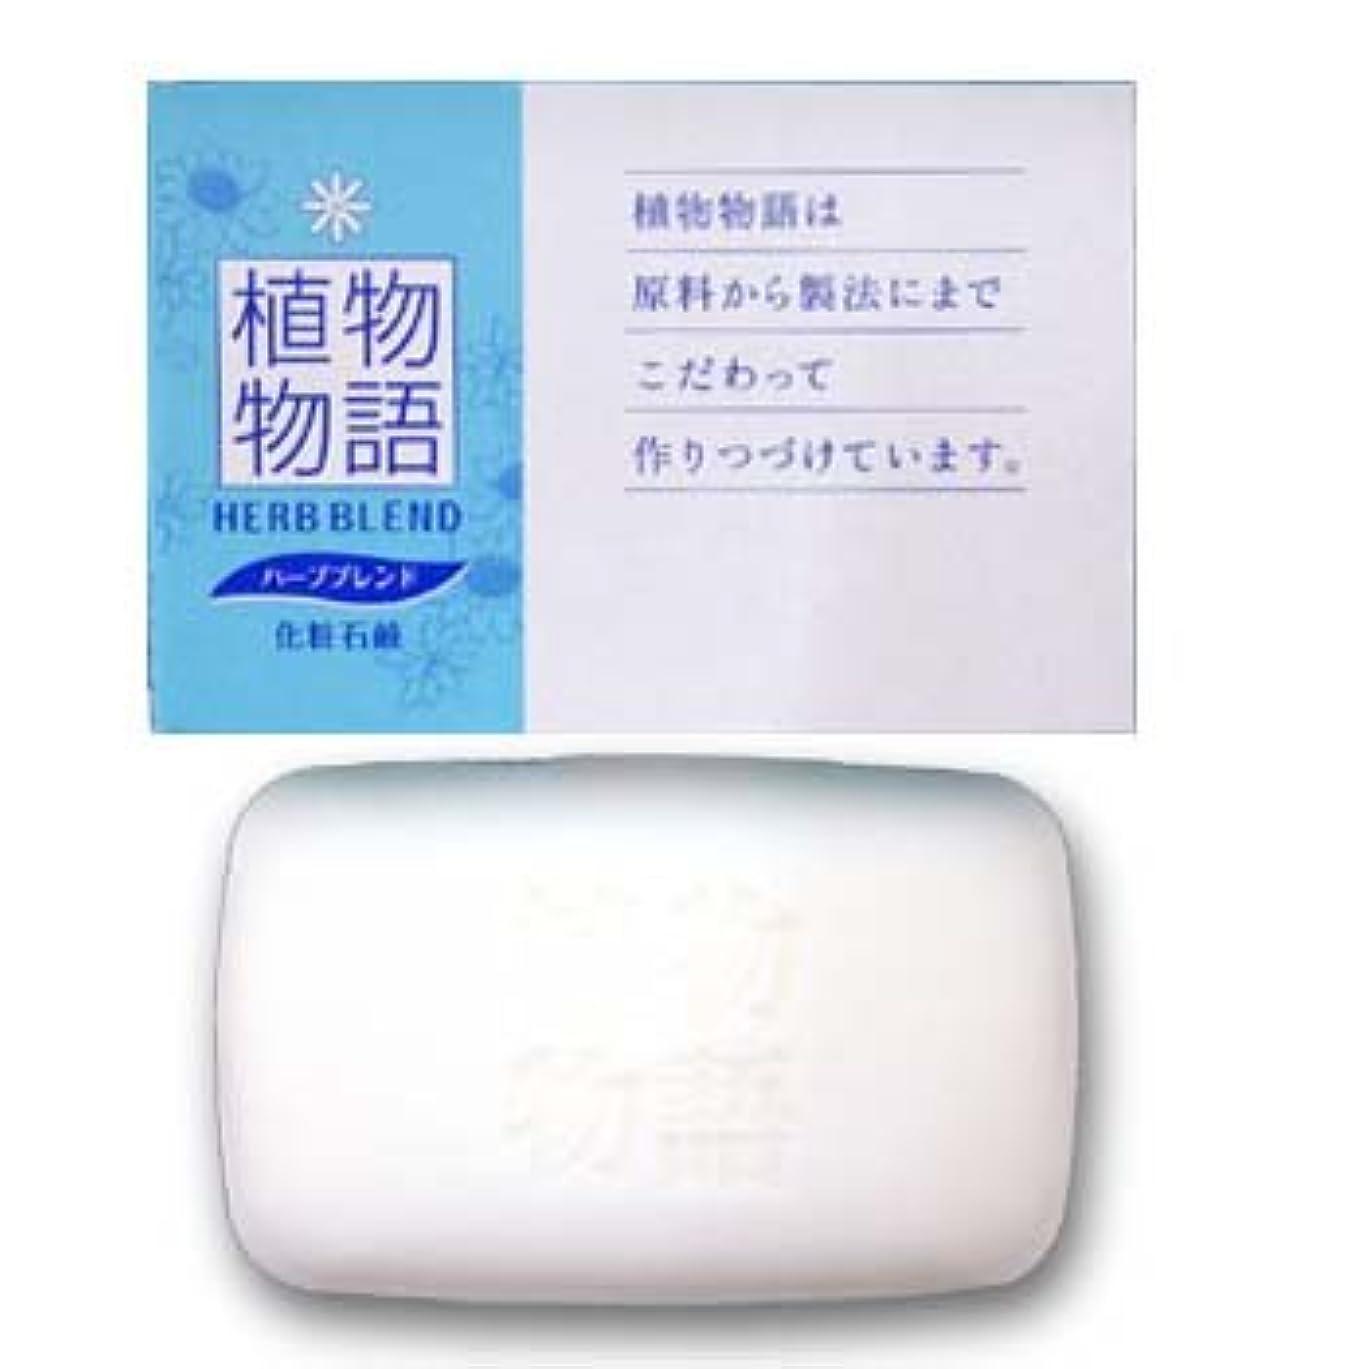 惑星宇宙の換気LION 植物物語石鹸80g化粧箱入(1セット100個入)